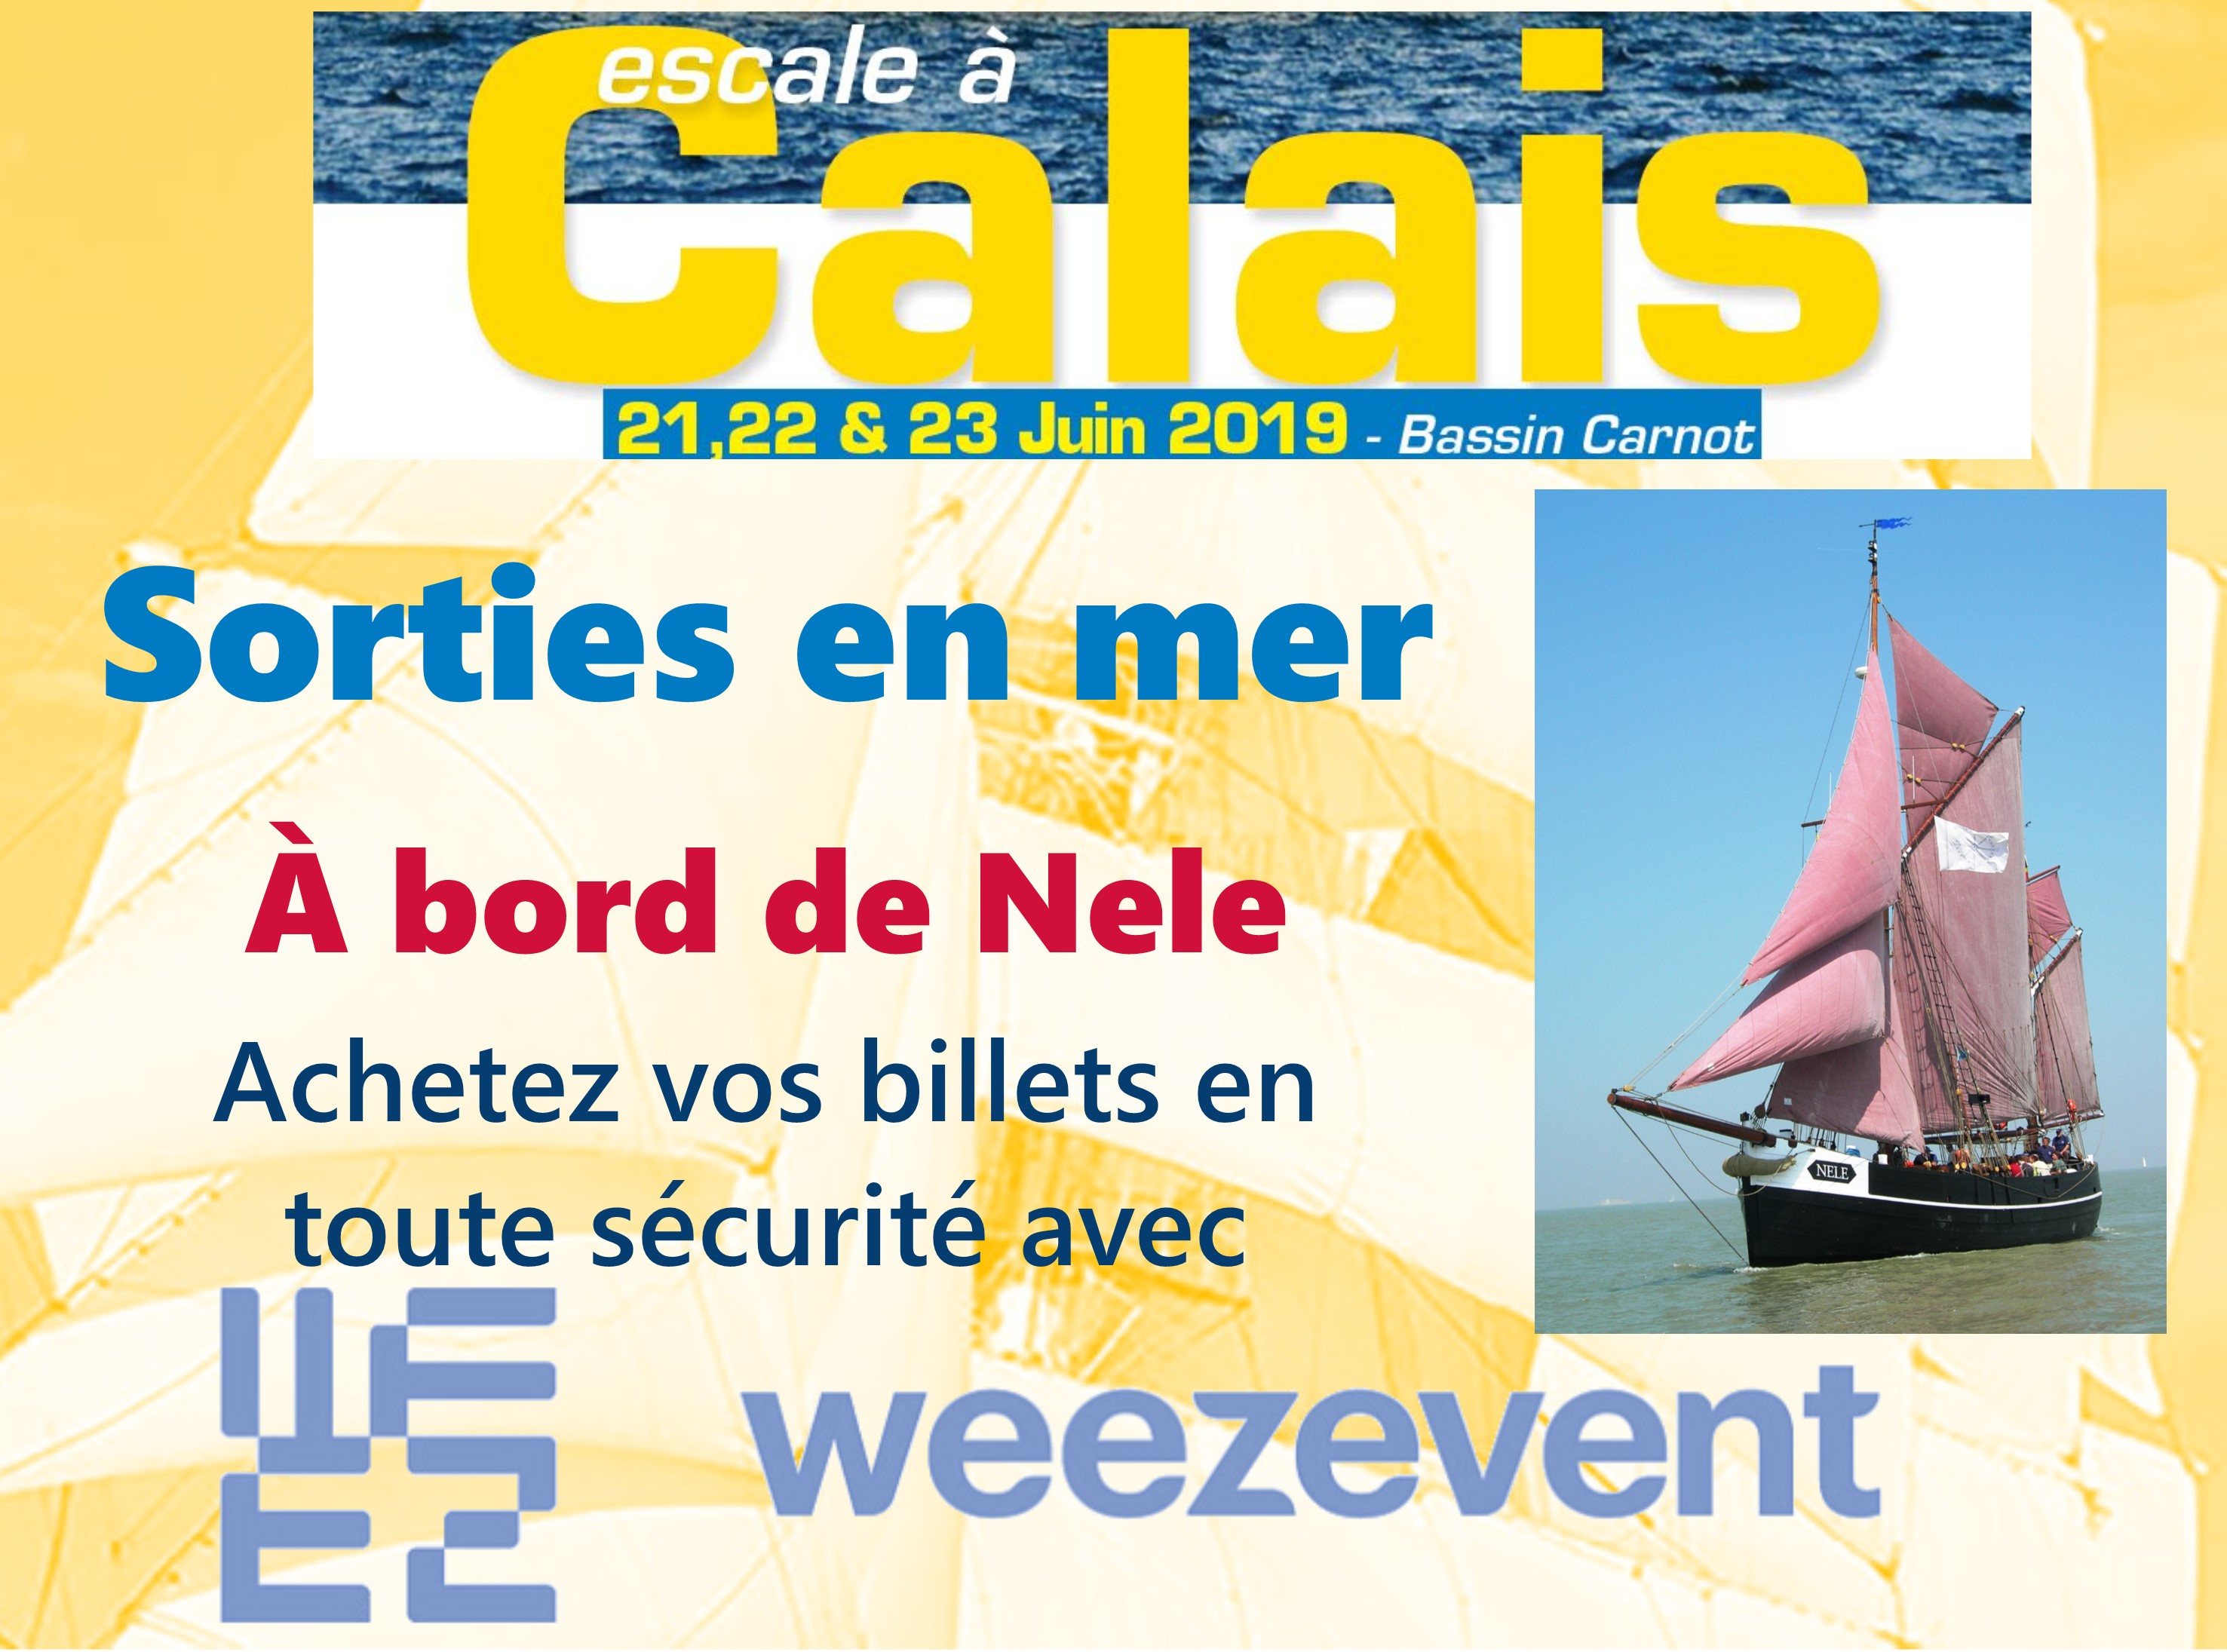 Achat sorties en mer Escale à Calais 2019